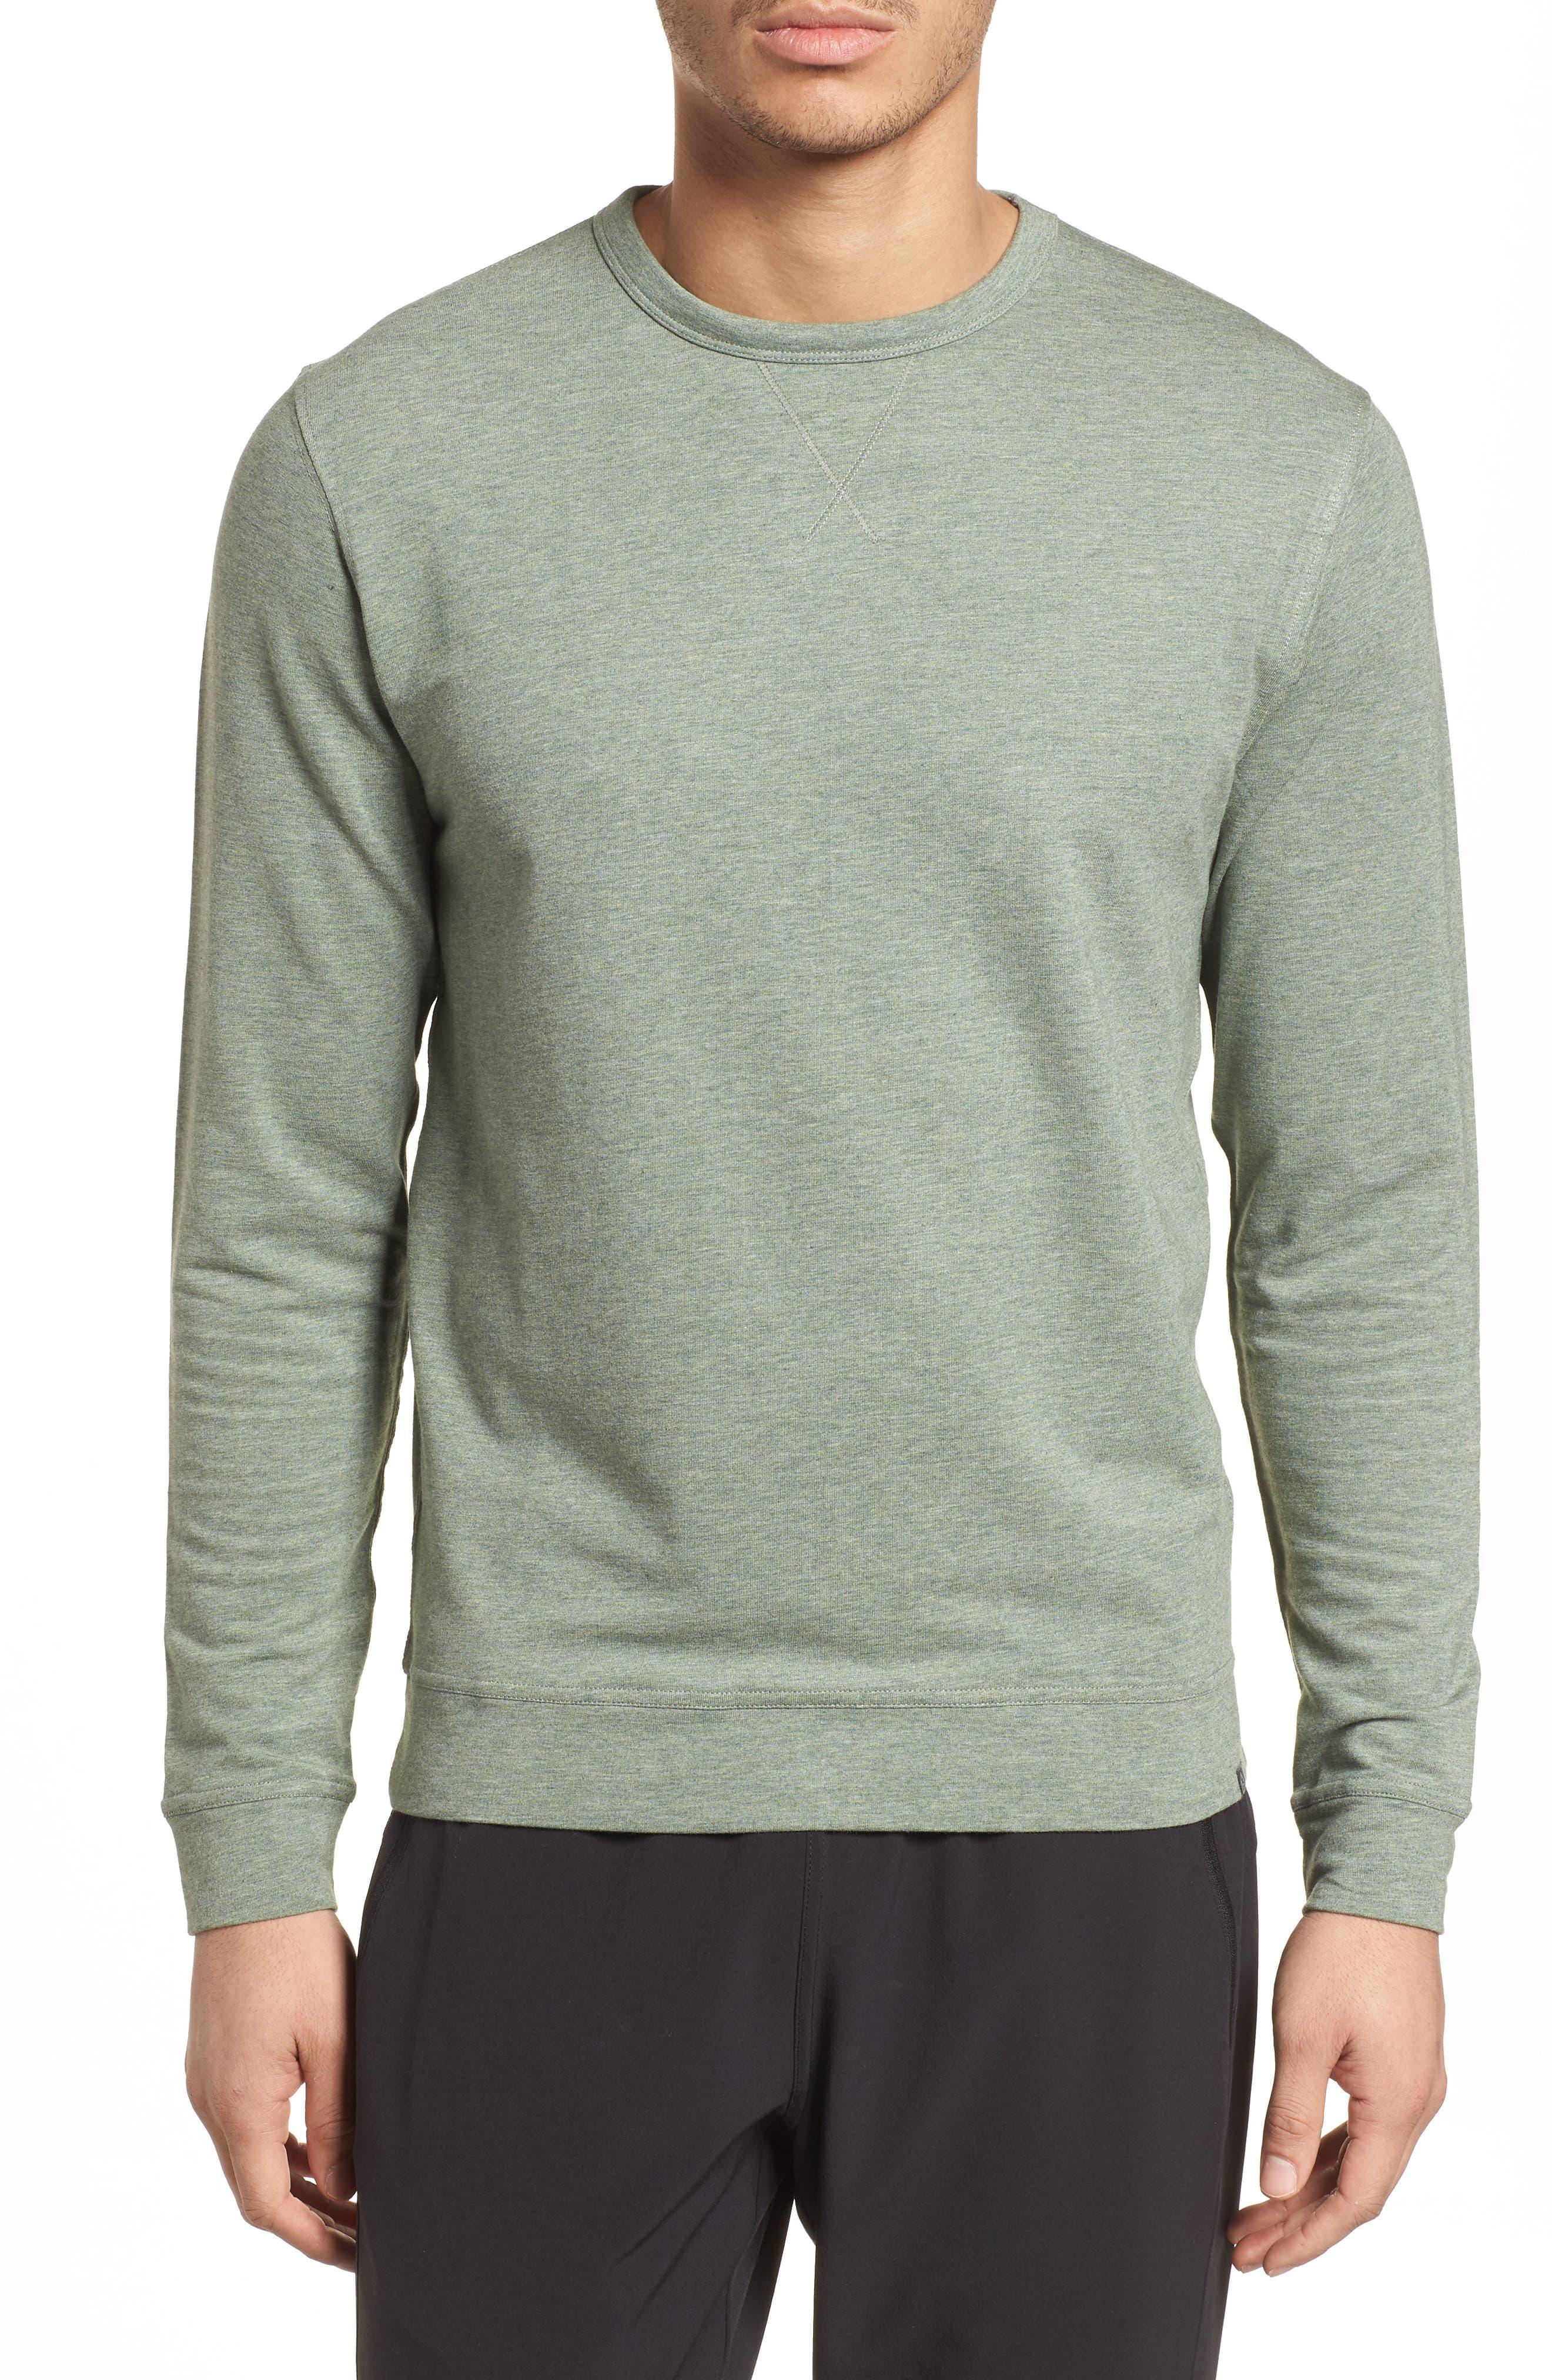 Legacy Crewneck Sweatshirt,                             Main thumbnail 1, color,                             Kelp Heather